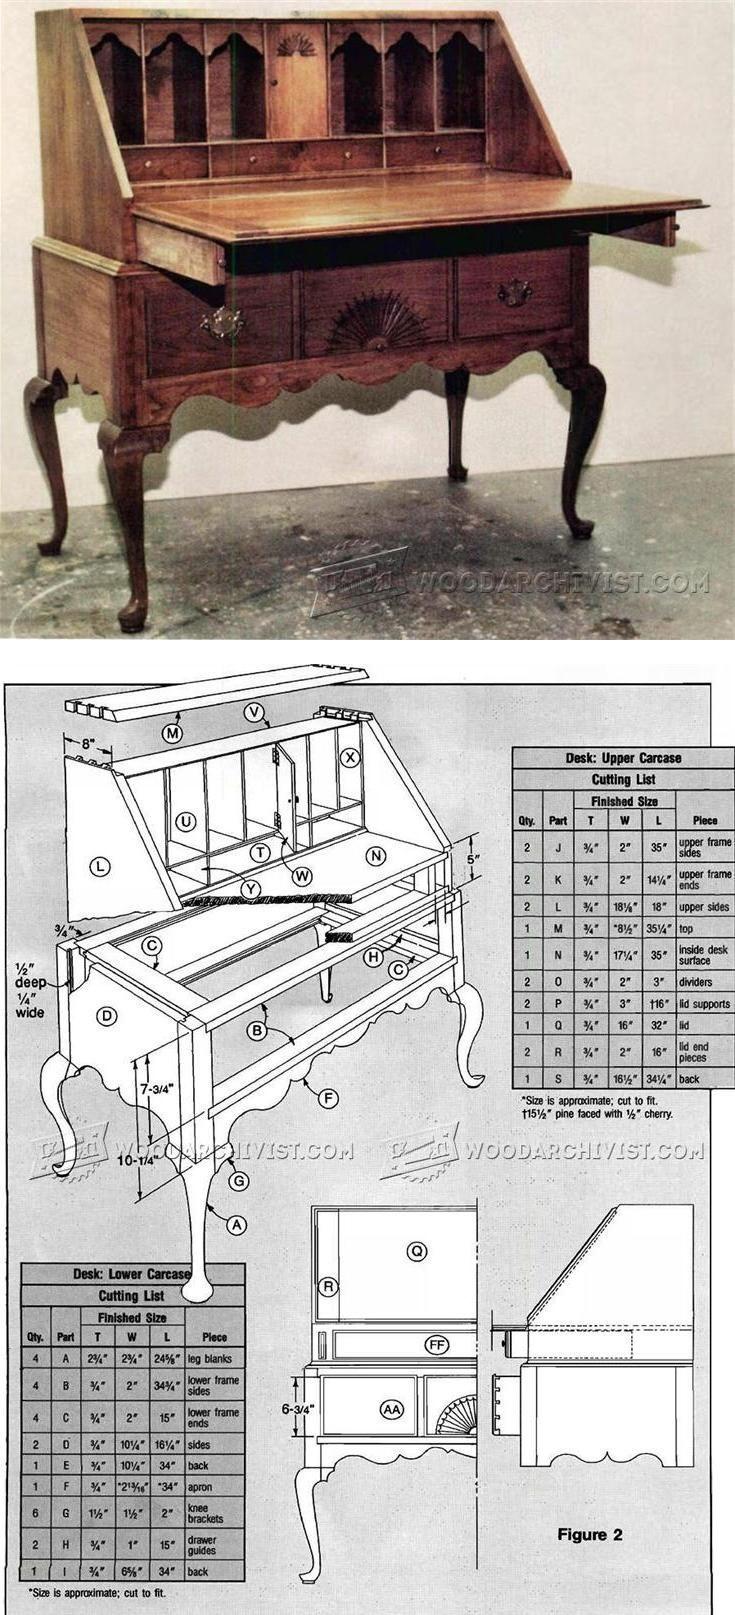 Secretary Desk Plans Furniture Plans And Projects Woodarchivist Com Woodworking Furniture Plans Woodworking Projects Diy Woodworking Projects Desk